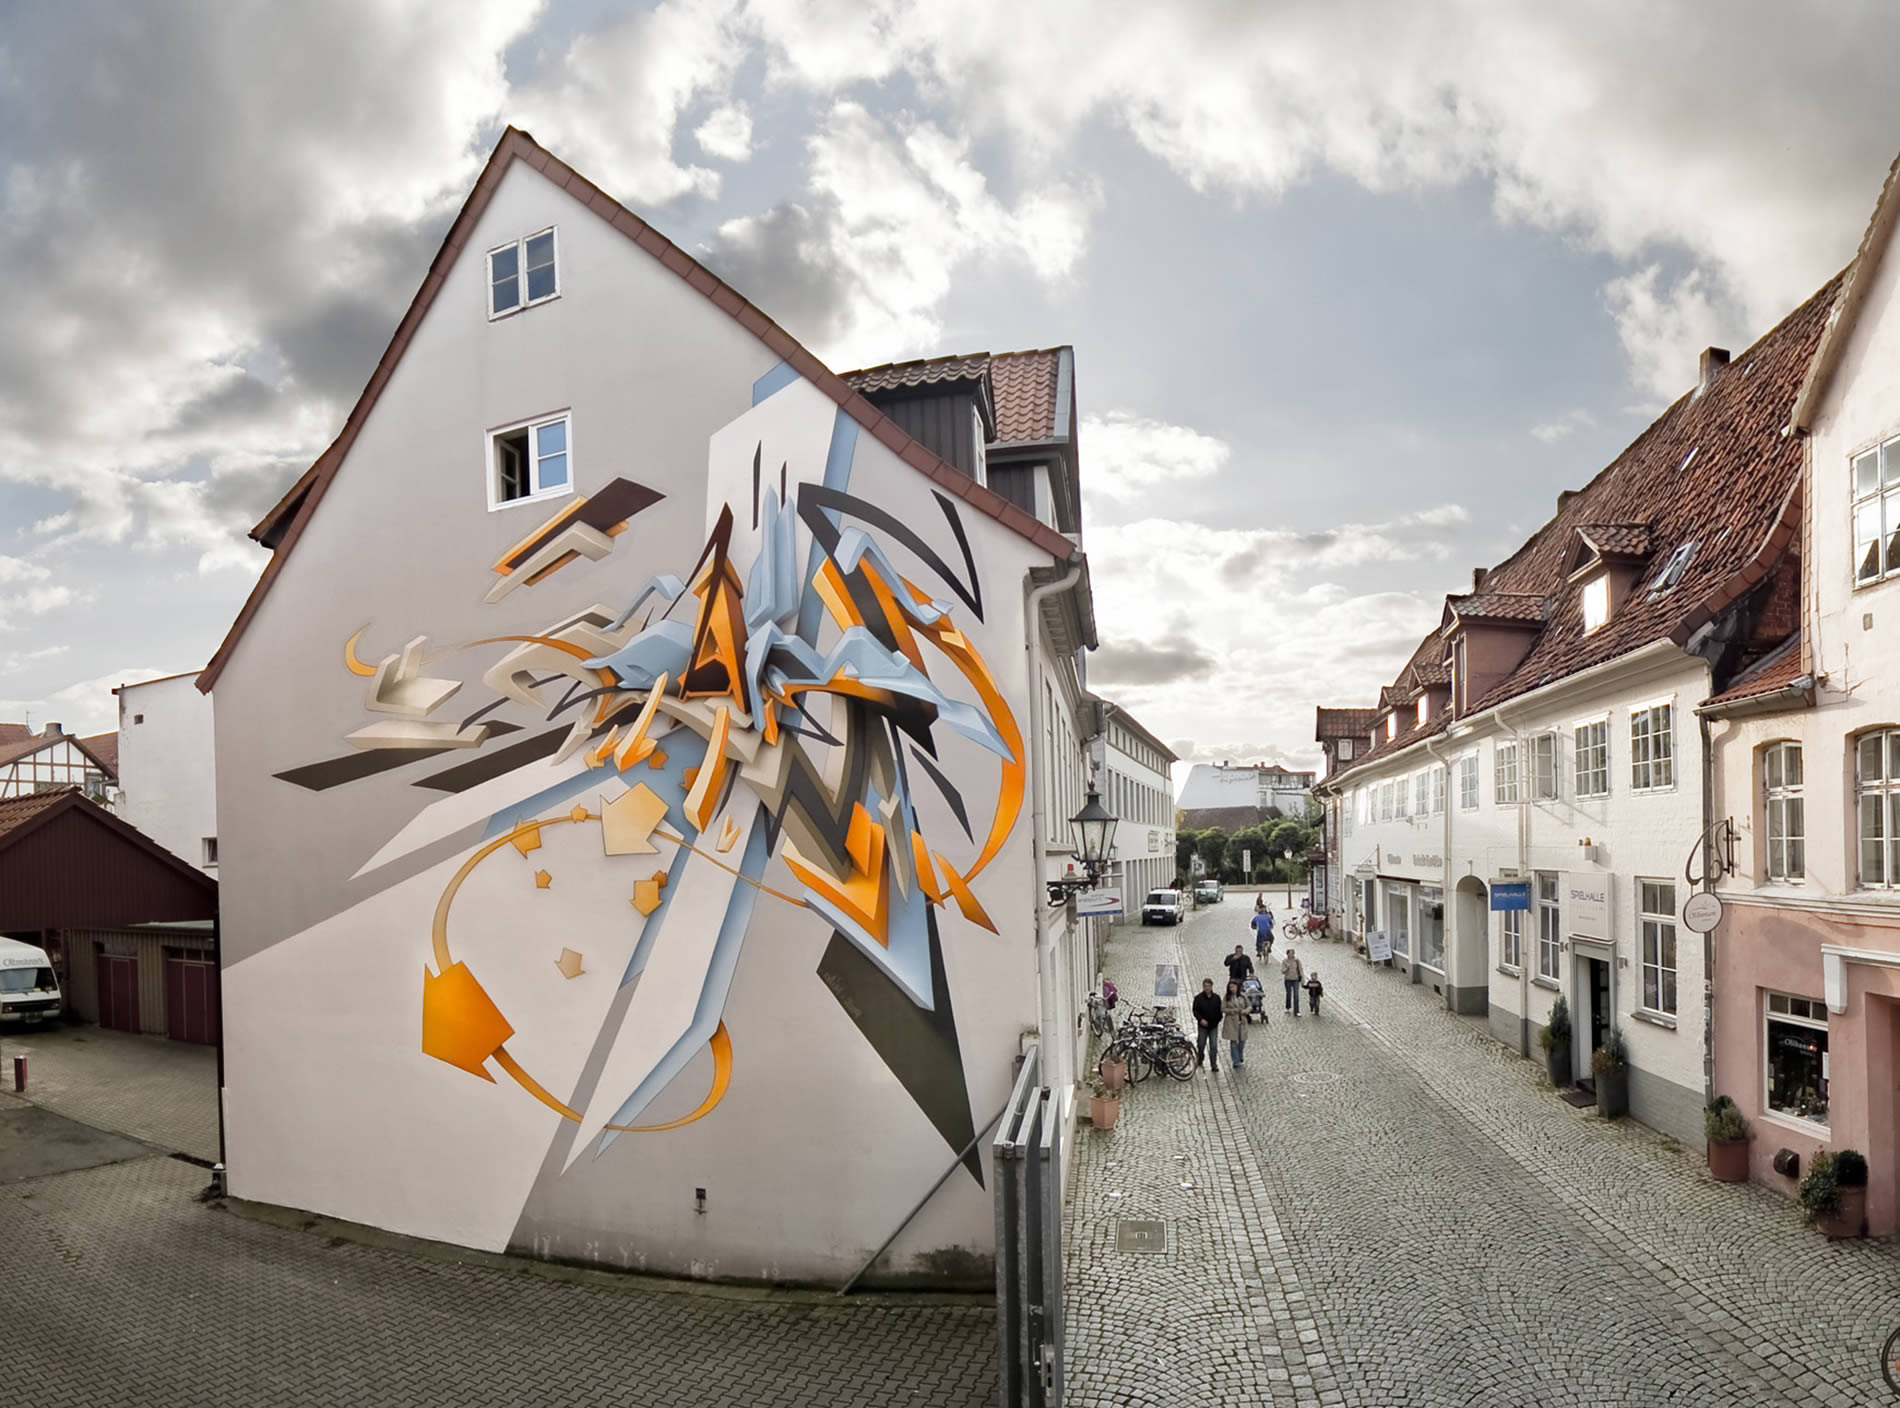 3d graffiti on building art by daim